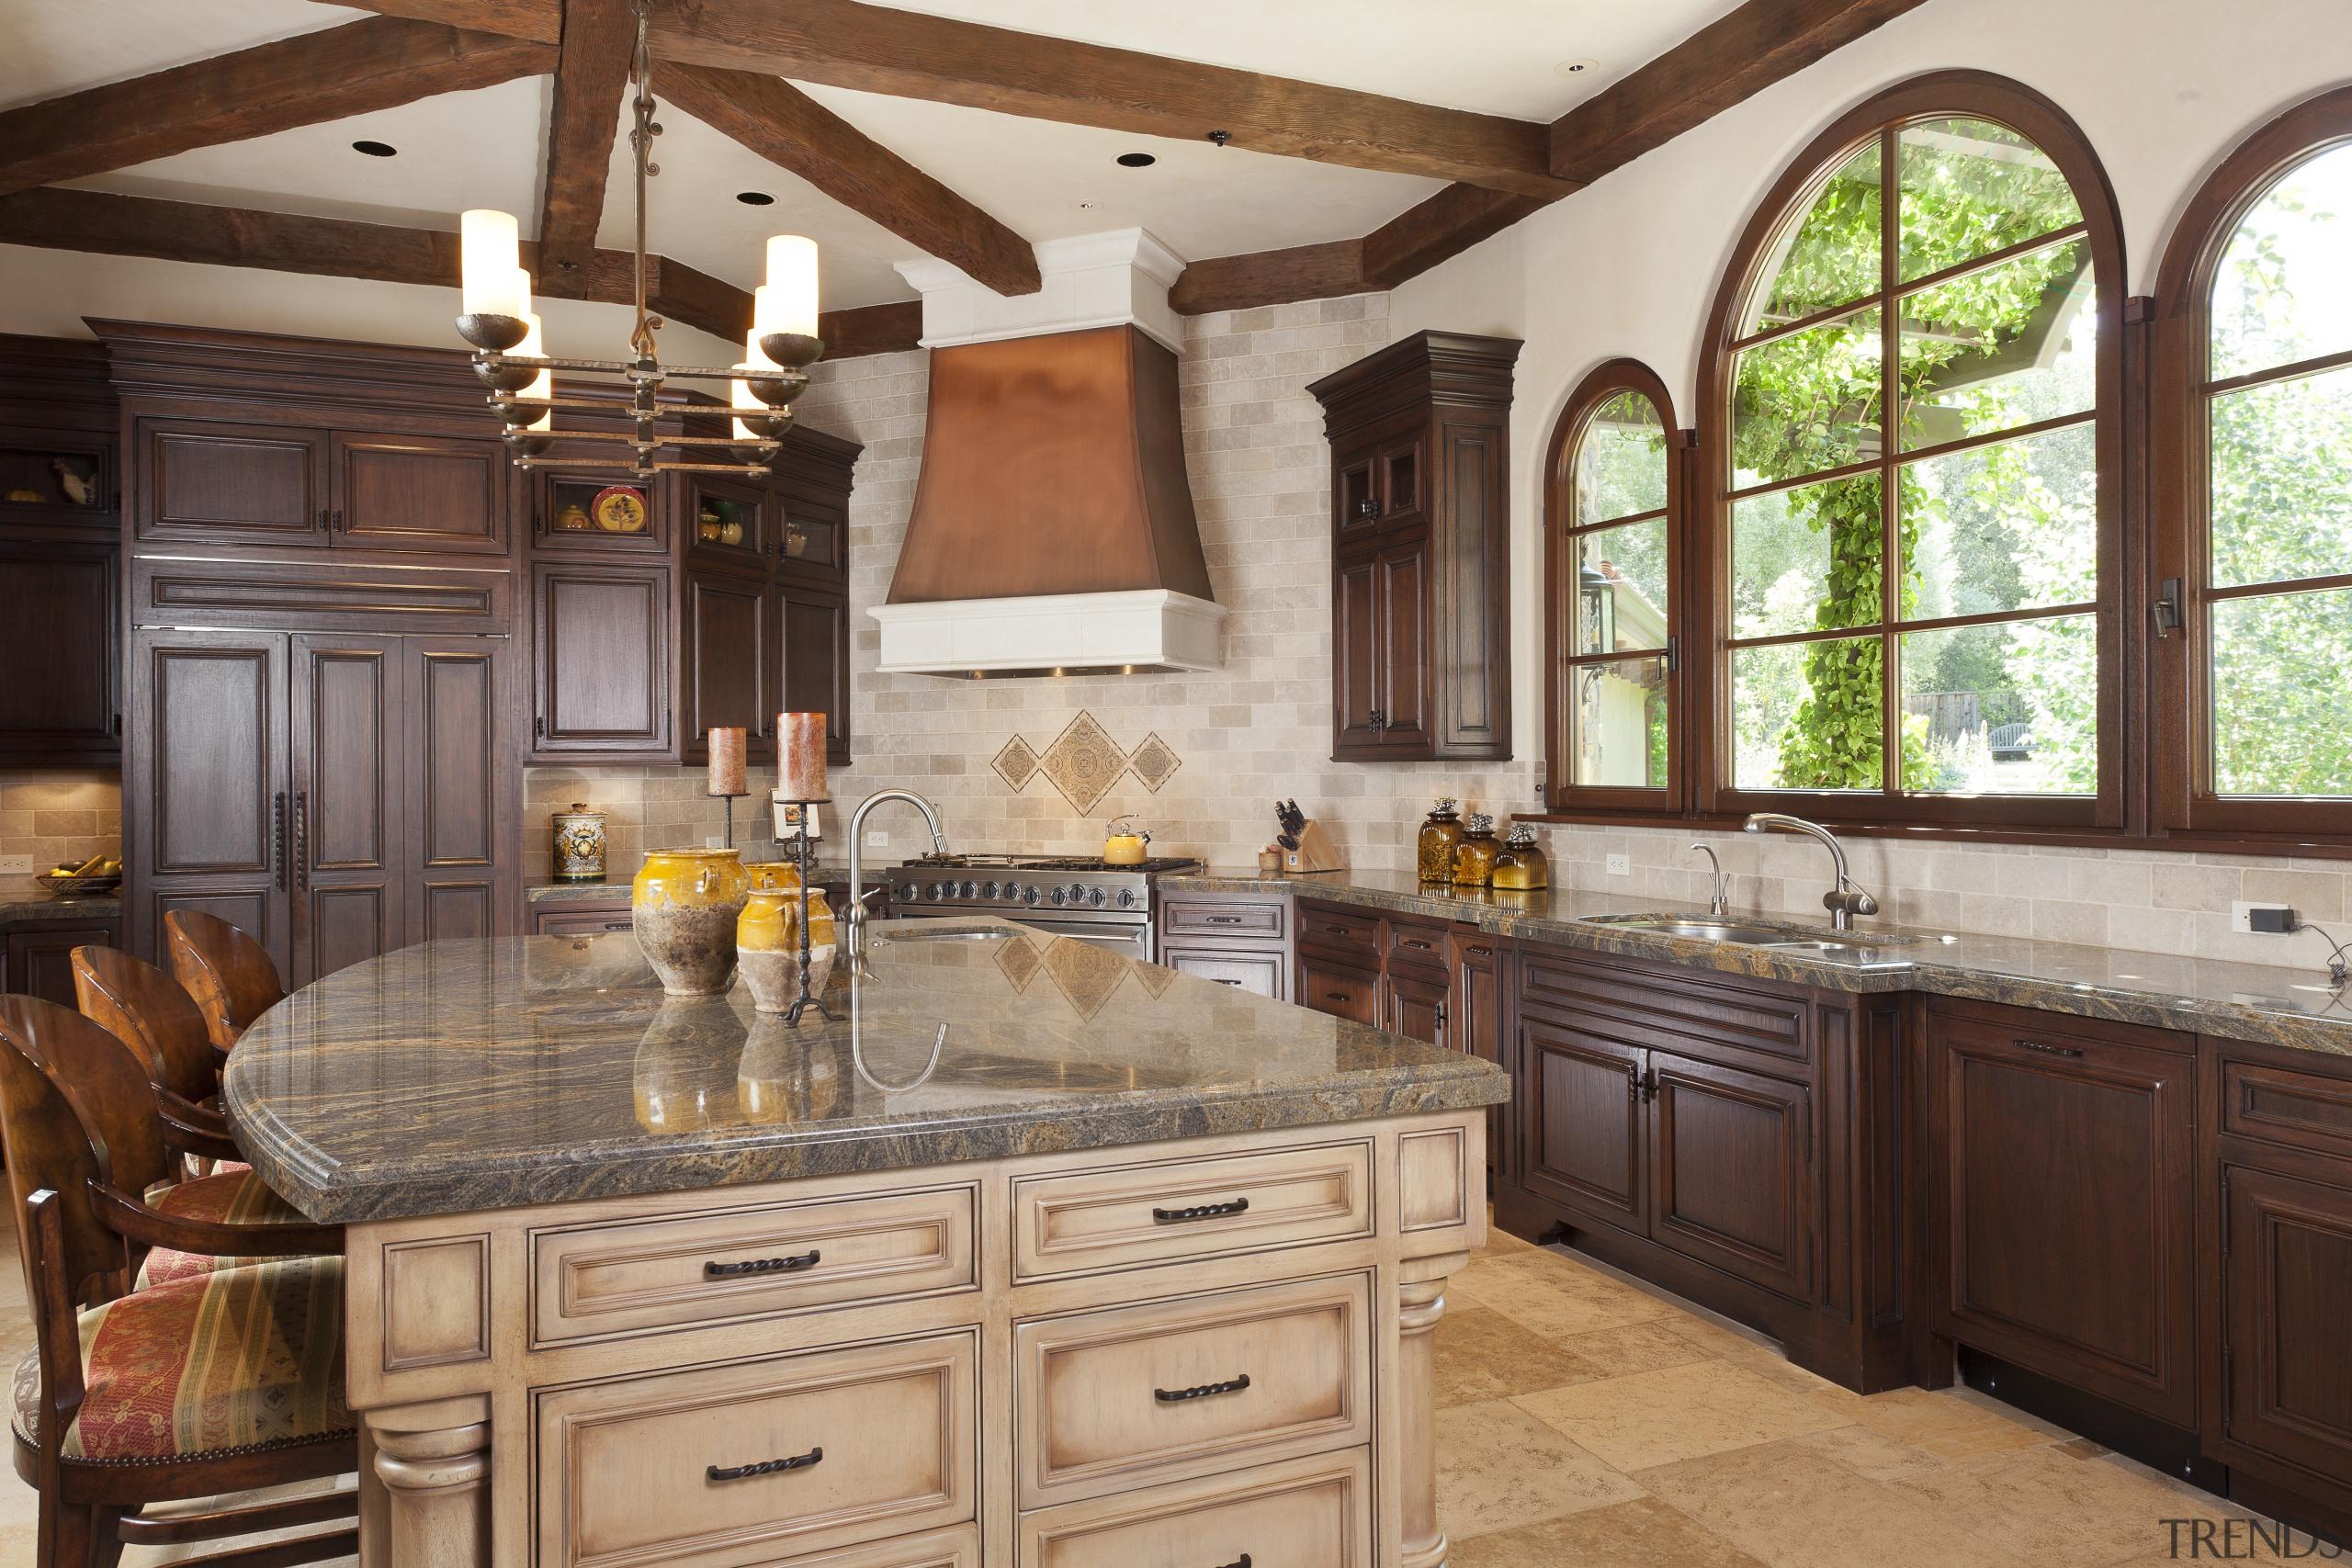 Santa Barbara-Meditteranean-style interior by Alison Whittaker cabinetry, countertop, cuisine classique, estate, home, interior design, kitchen, room, brown, gray